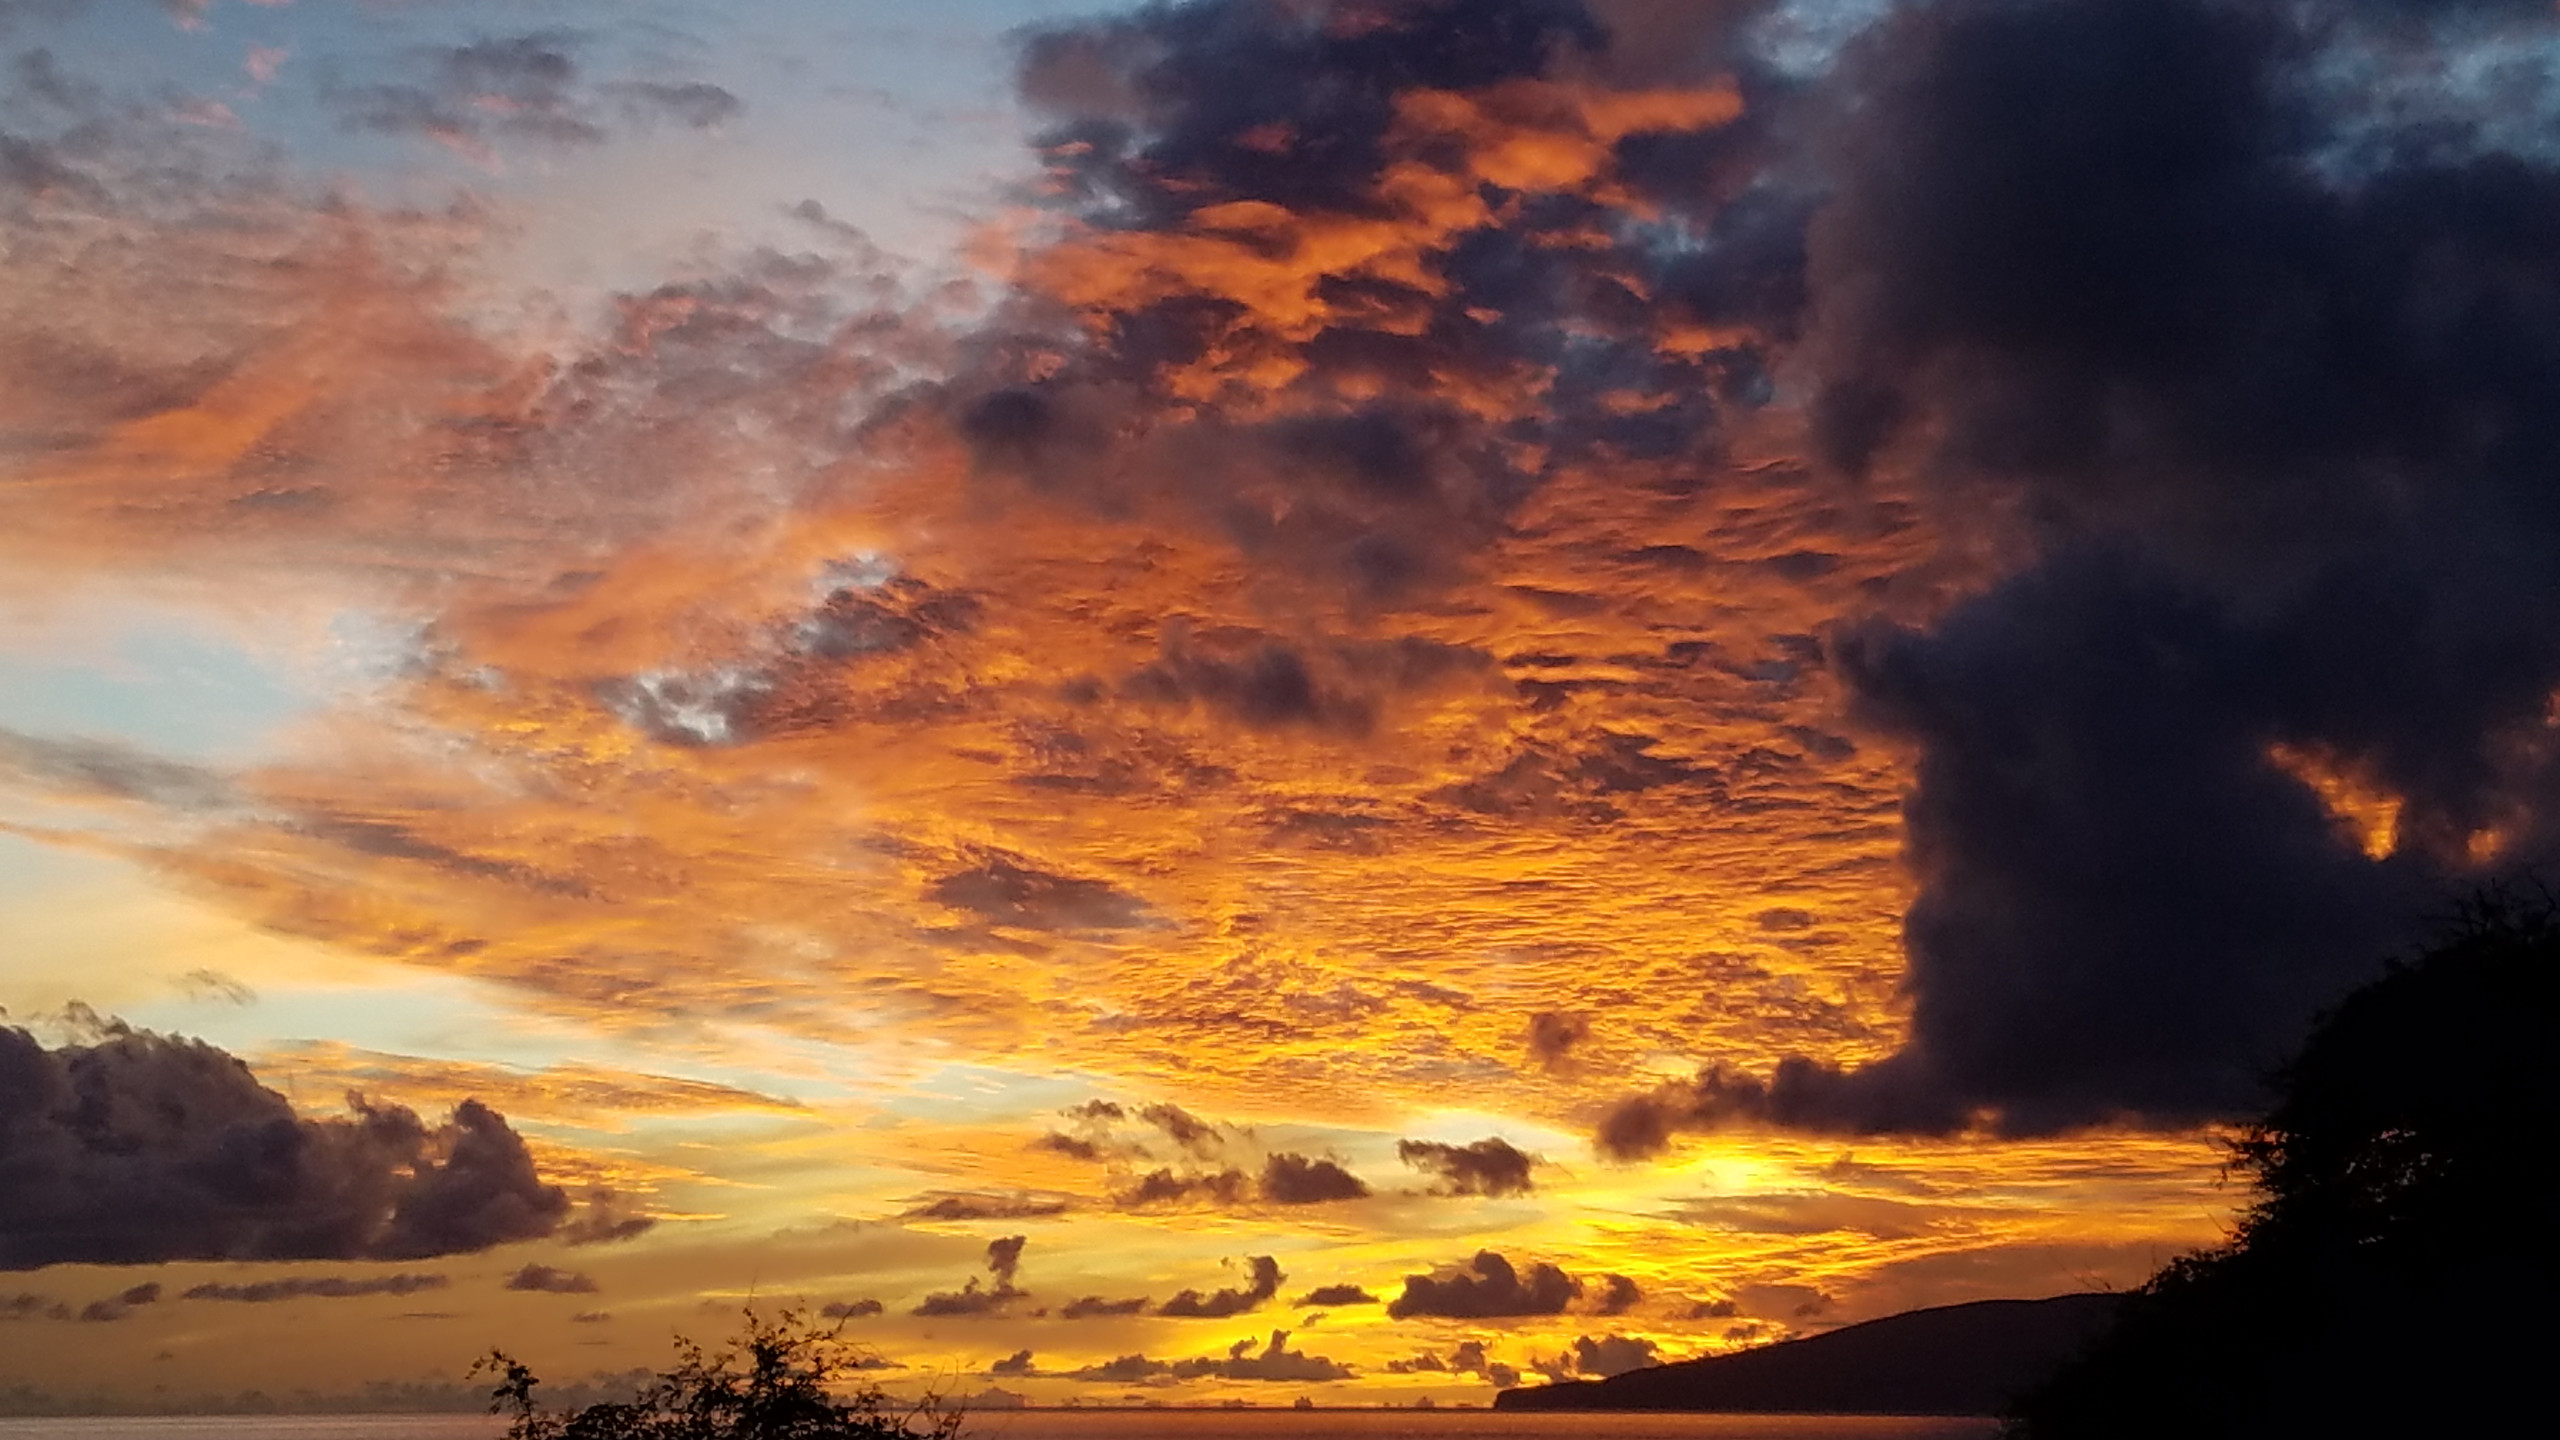 Sunset West Maui, HI